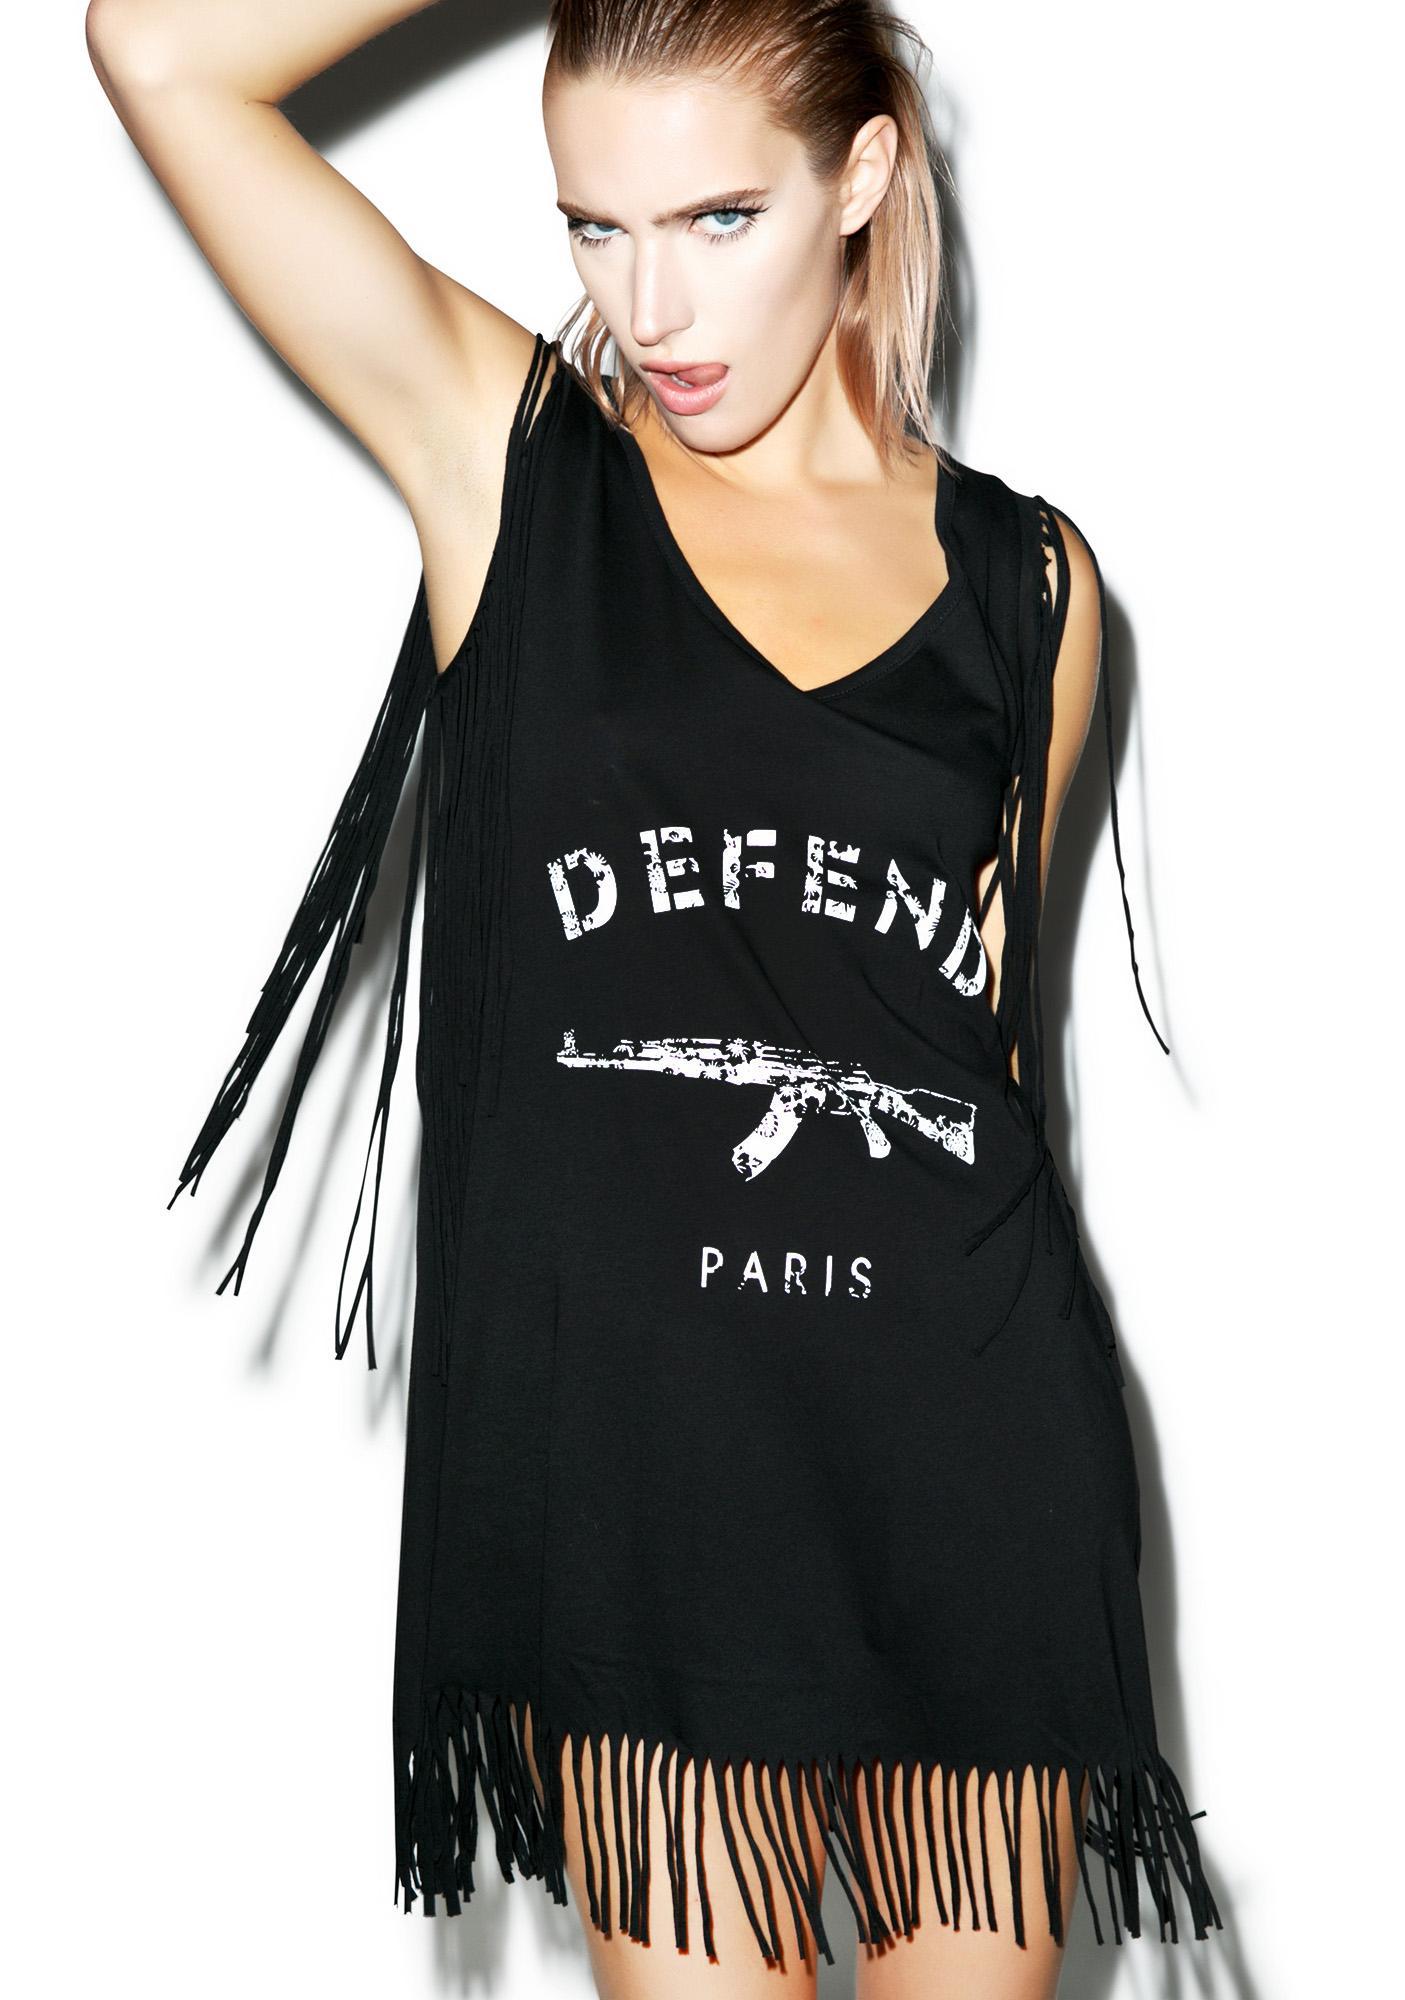 Defend Paris Fringe Dress